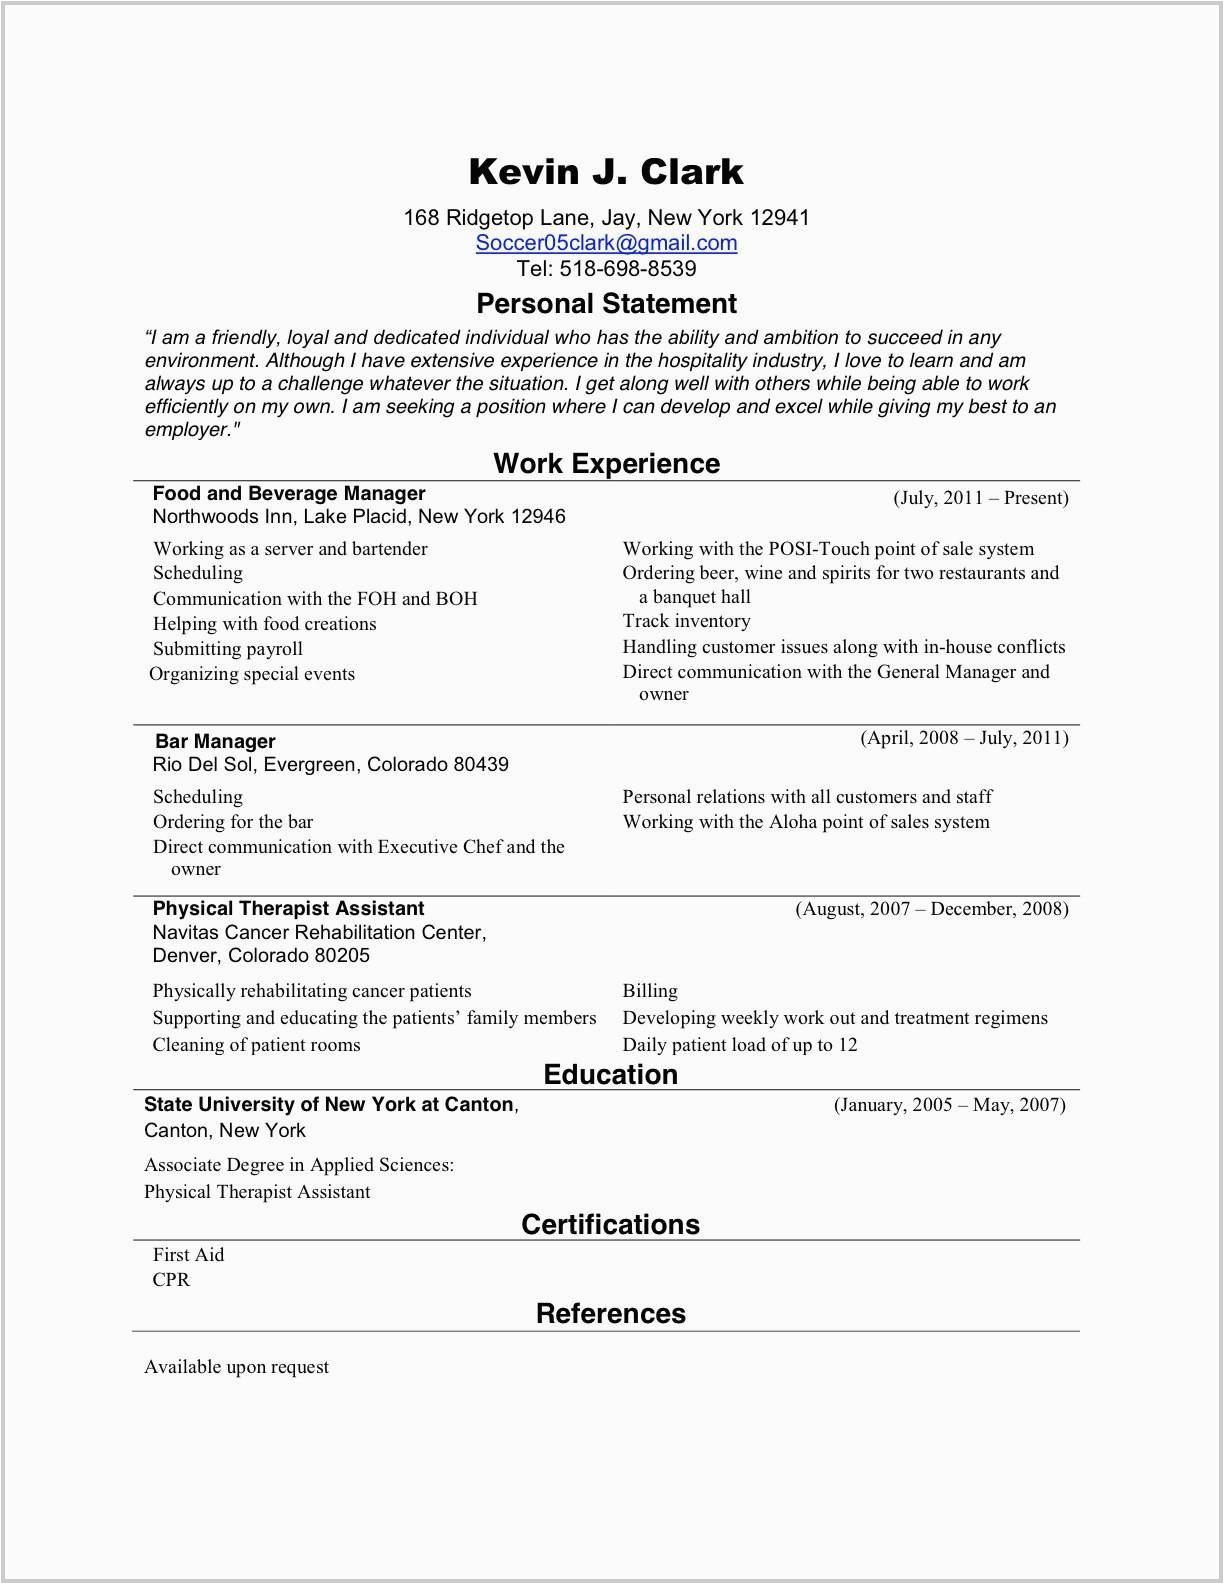 Sample Resume for New Graduate Lpn Nurse 11 12 Lvn Nursing Resume Examples Lascazuelasphilly